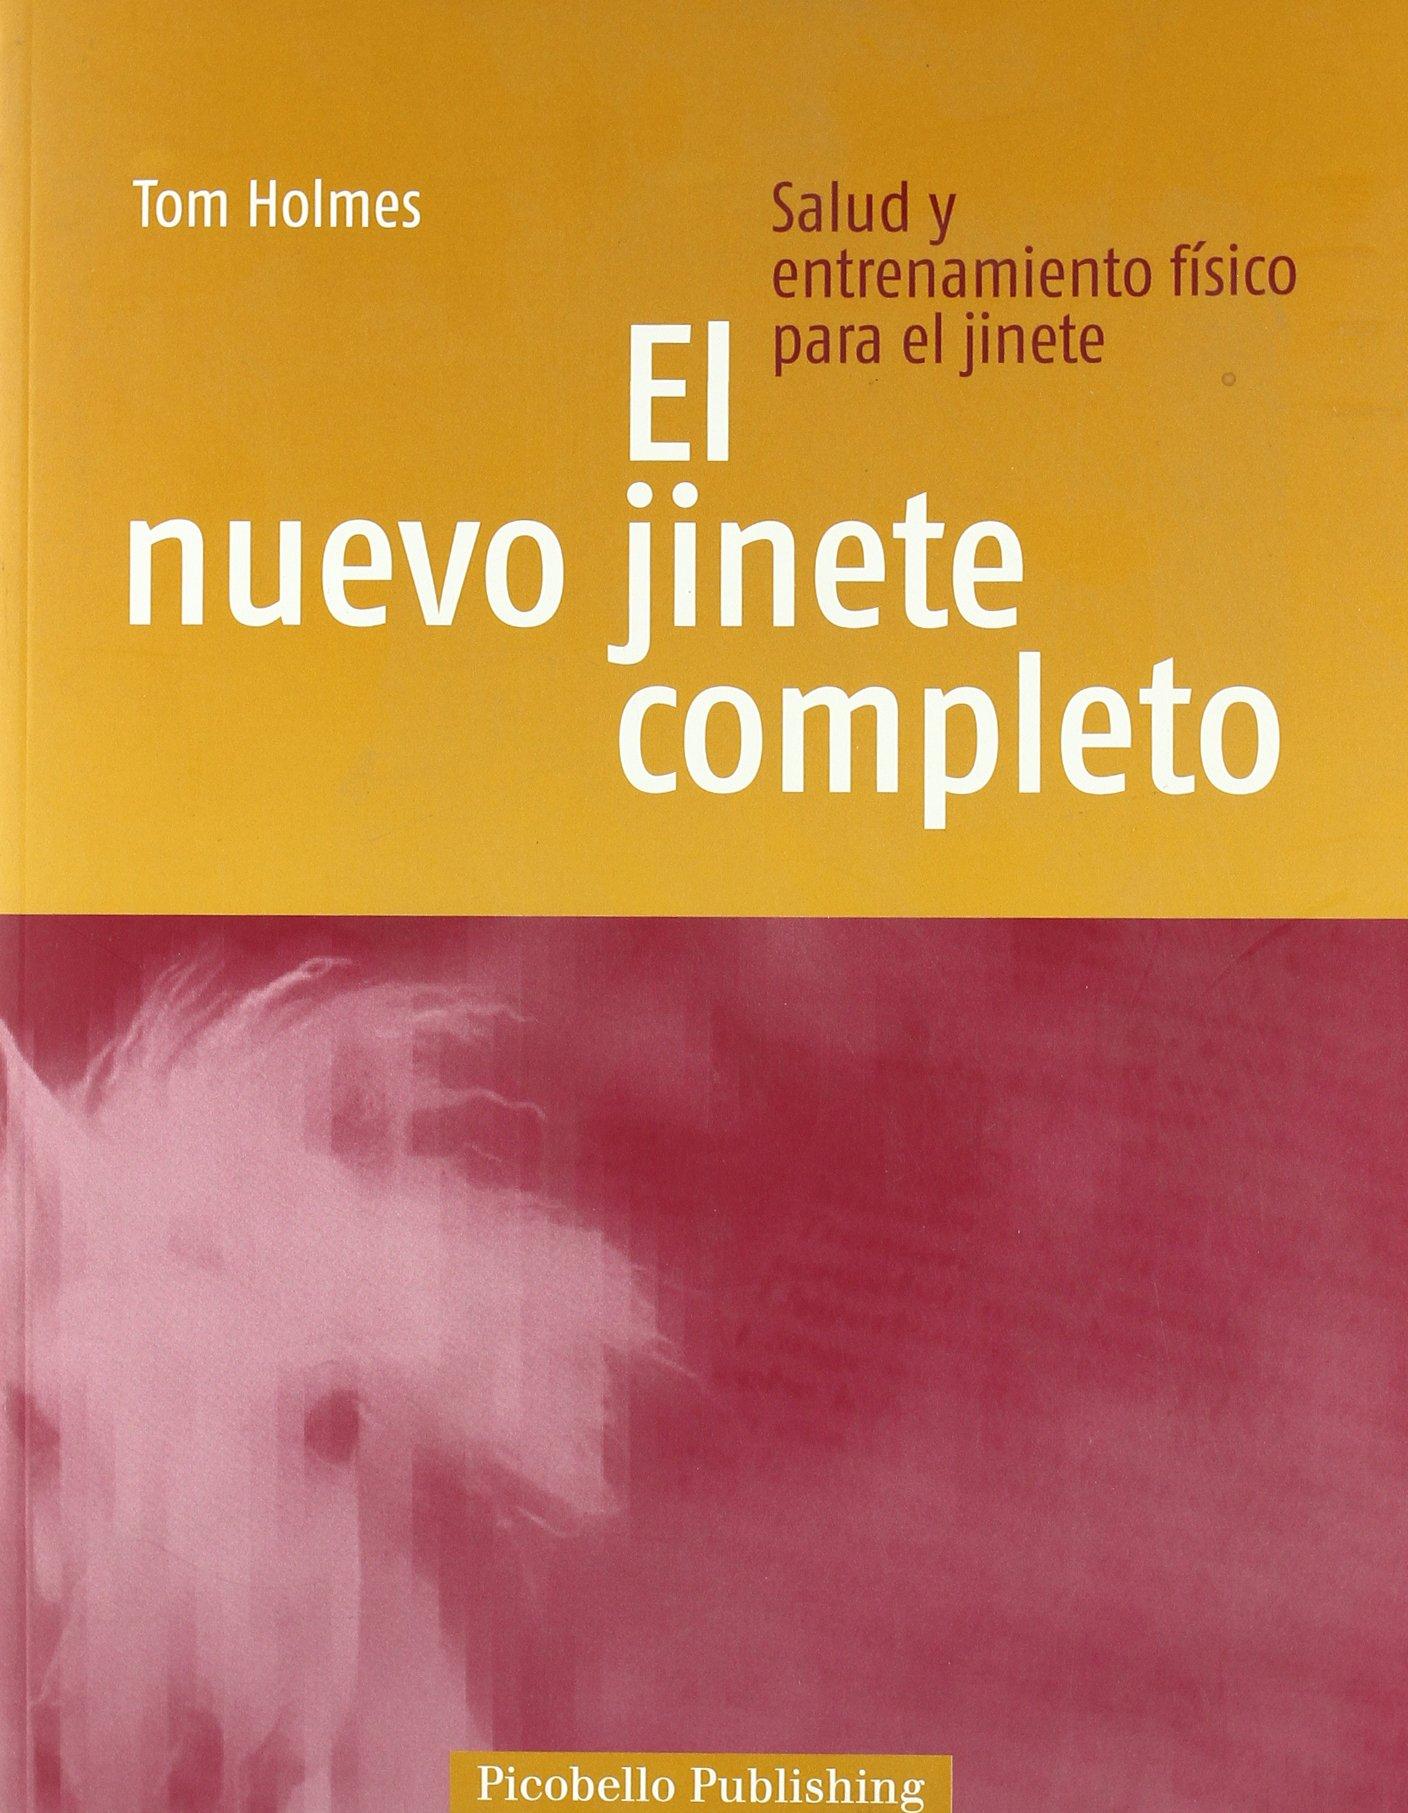 Nuevo jinete completo, el Tapa blanda – 6 sep 2010 Tom Holmes Picobello Publishing 8493586102 1199421